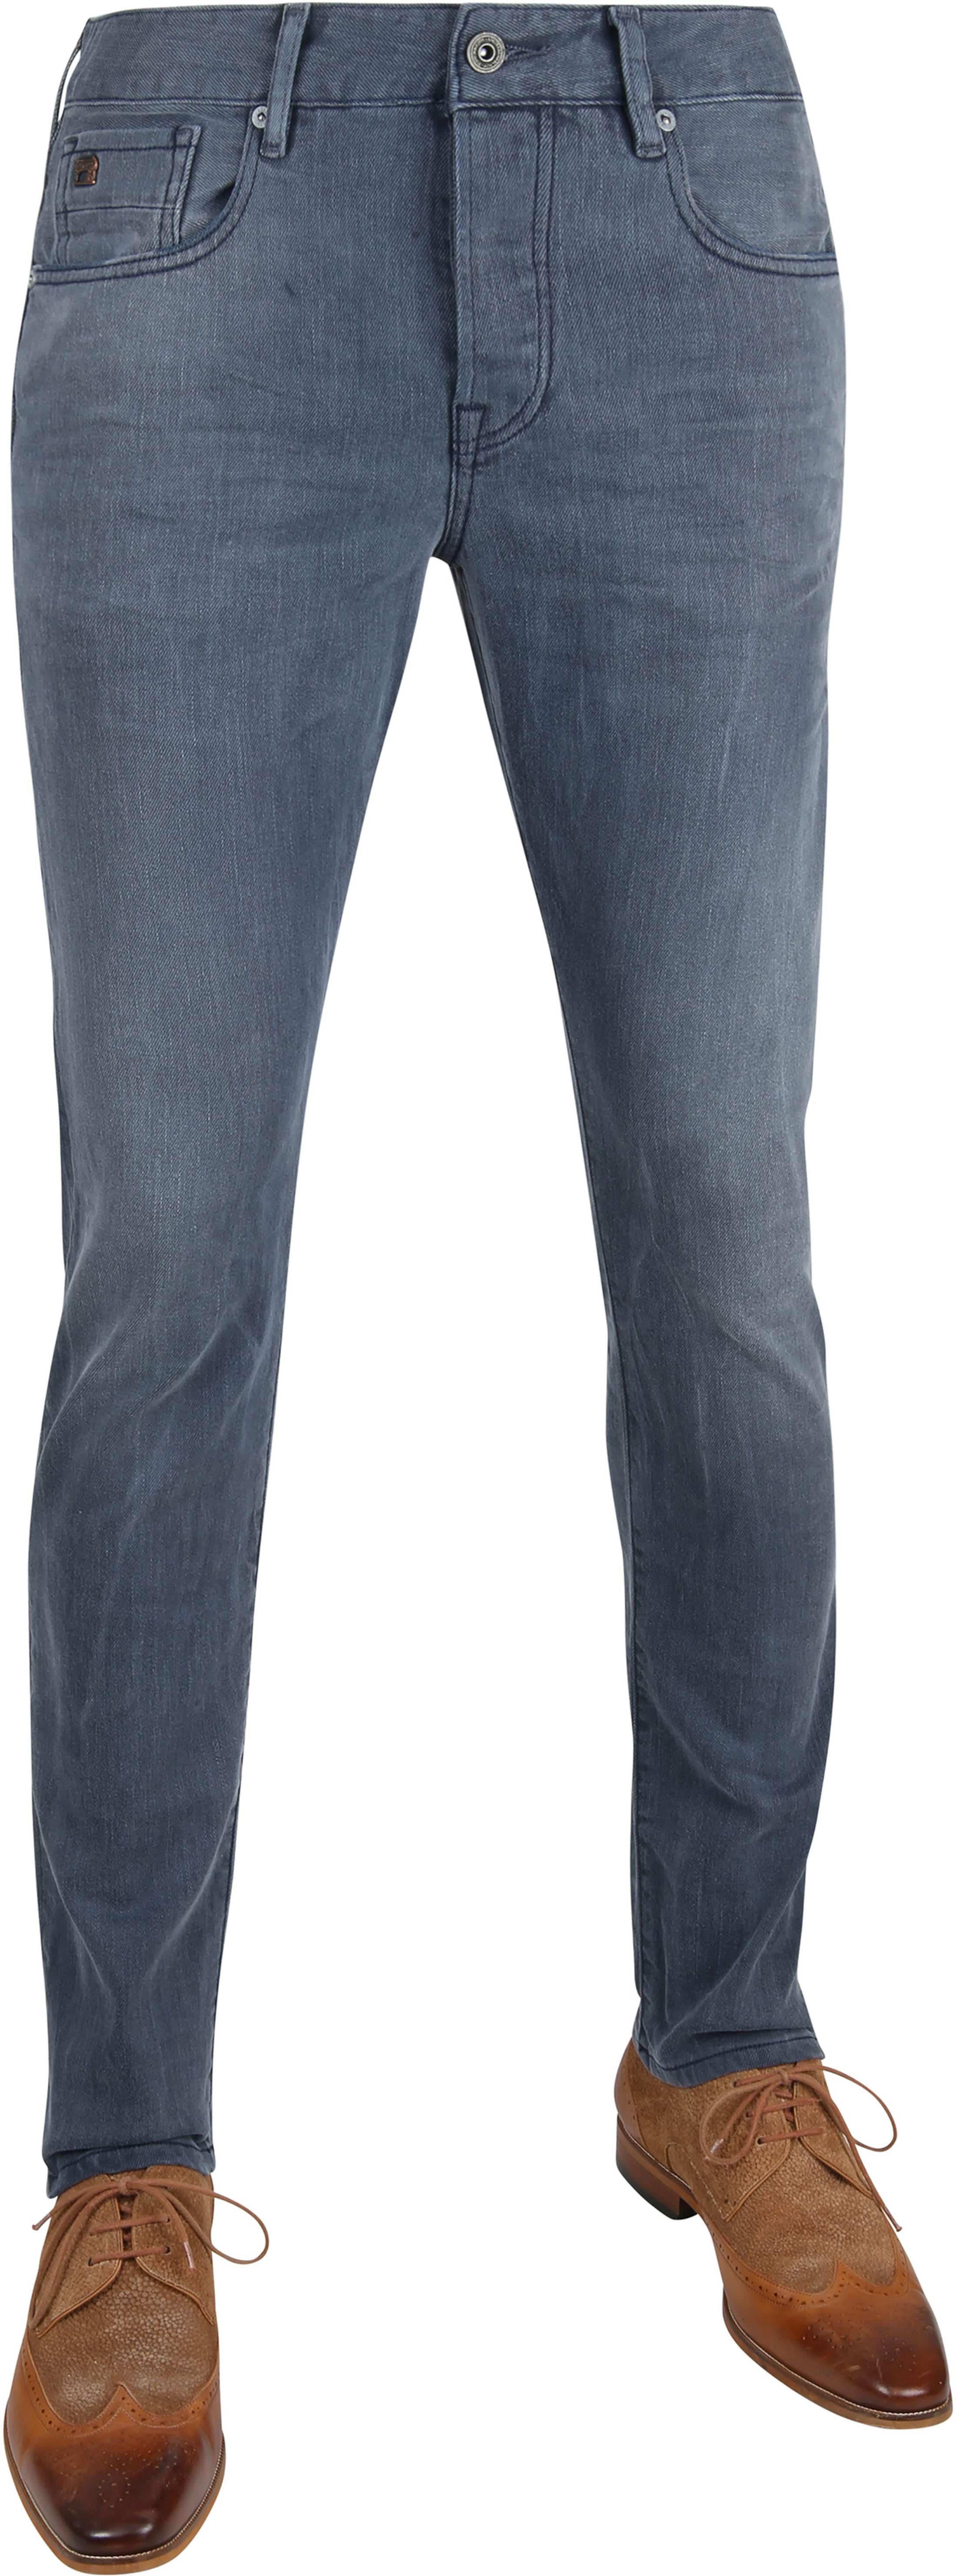 Scotch & Soda Ralston Jeans Concrete Bleach foto 0